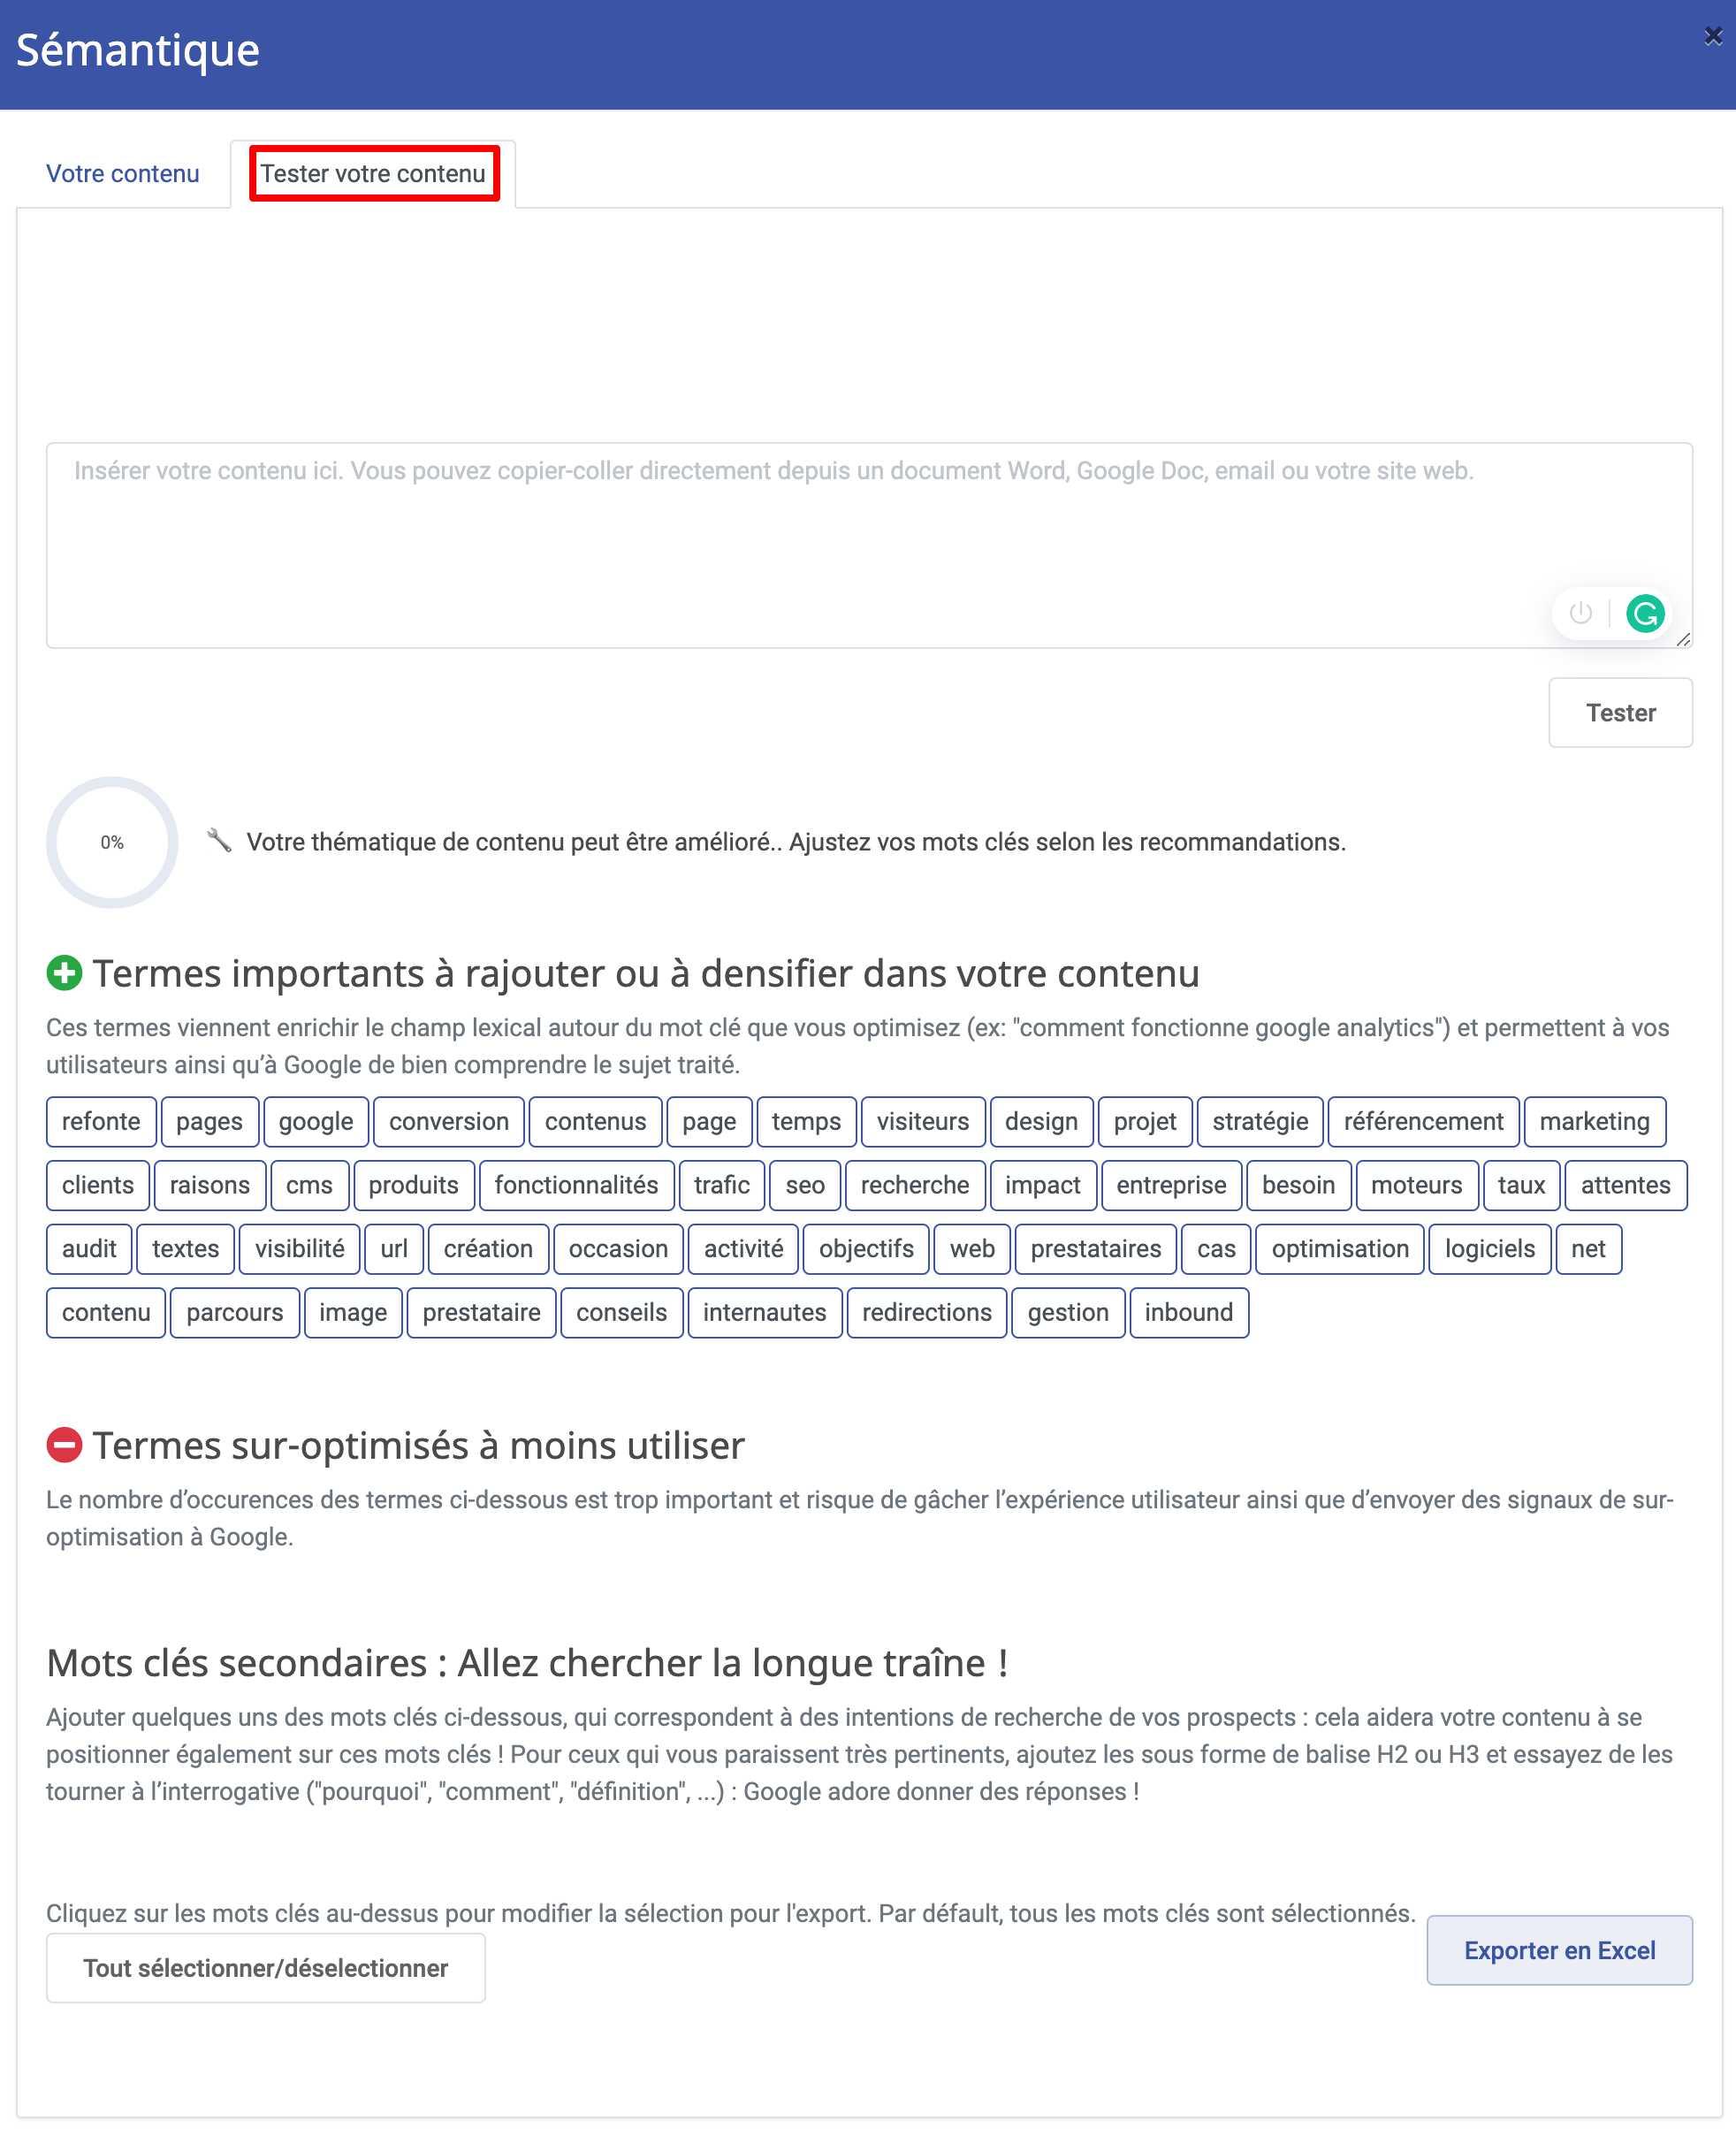 SmartKeyword-outil-tester-votre-contenu